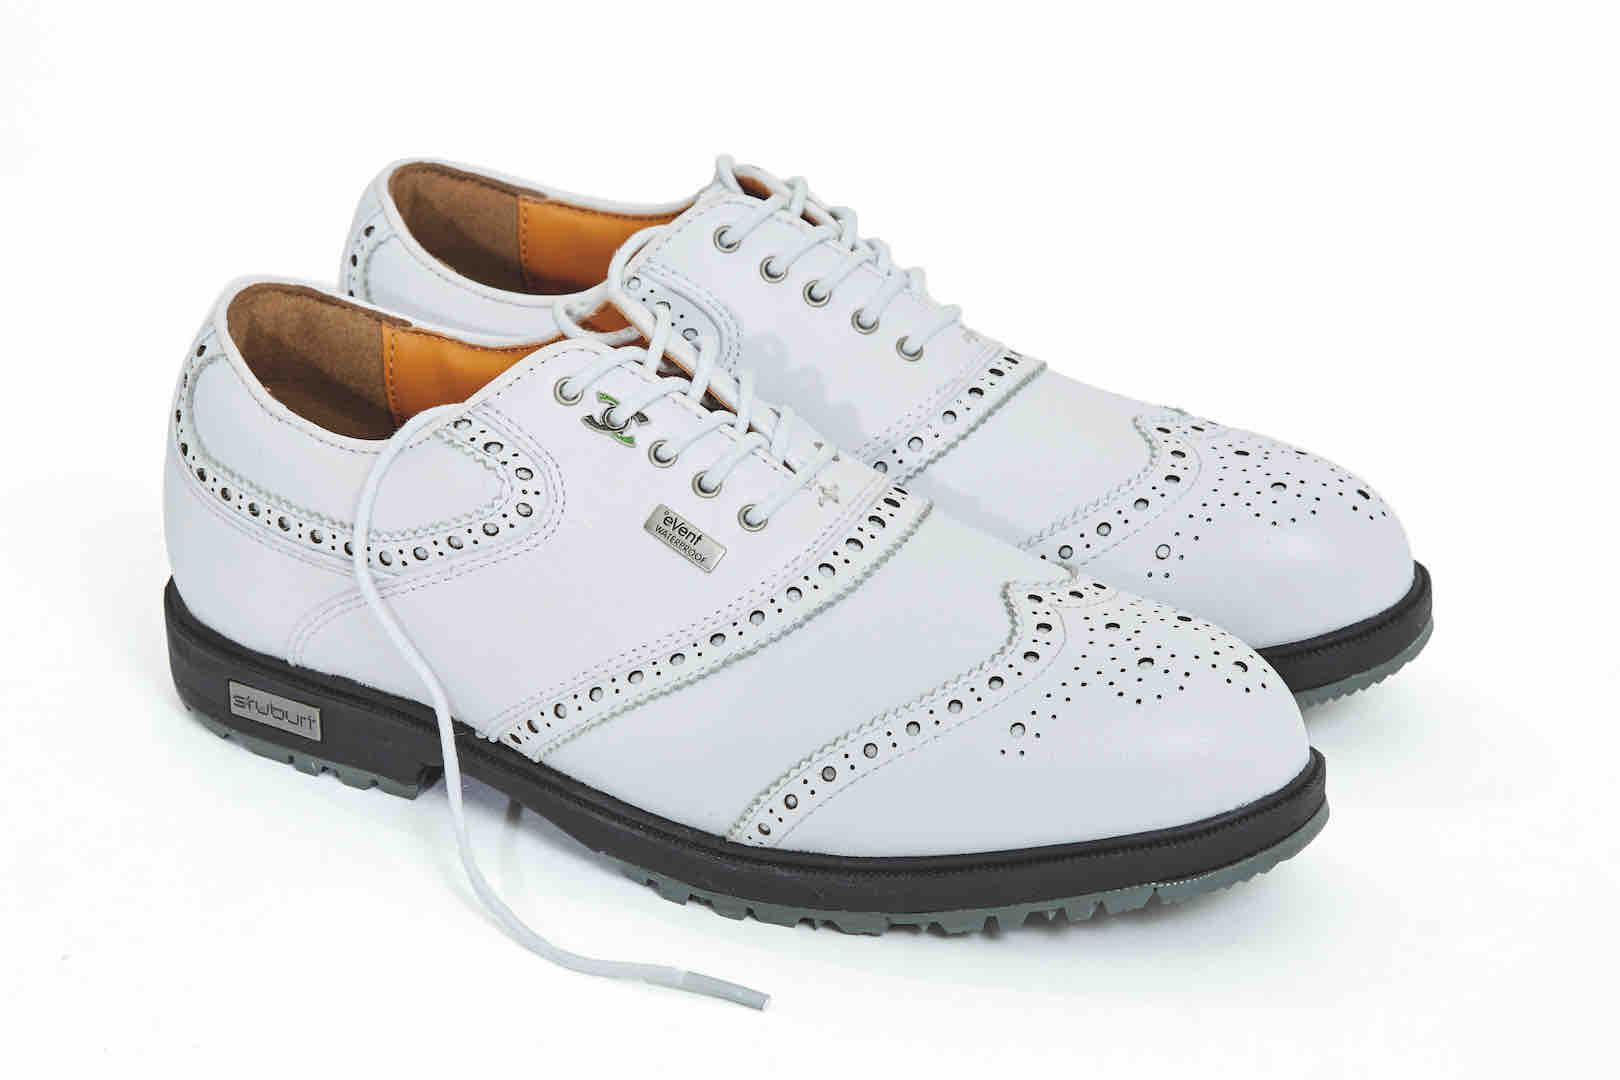 Stuburt Golf release 2017 shoe range